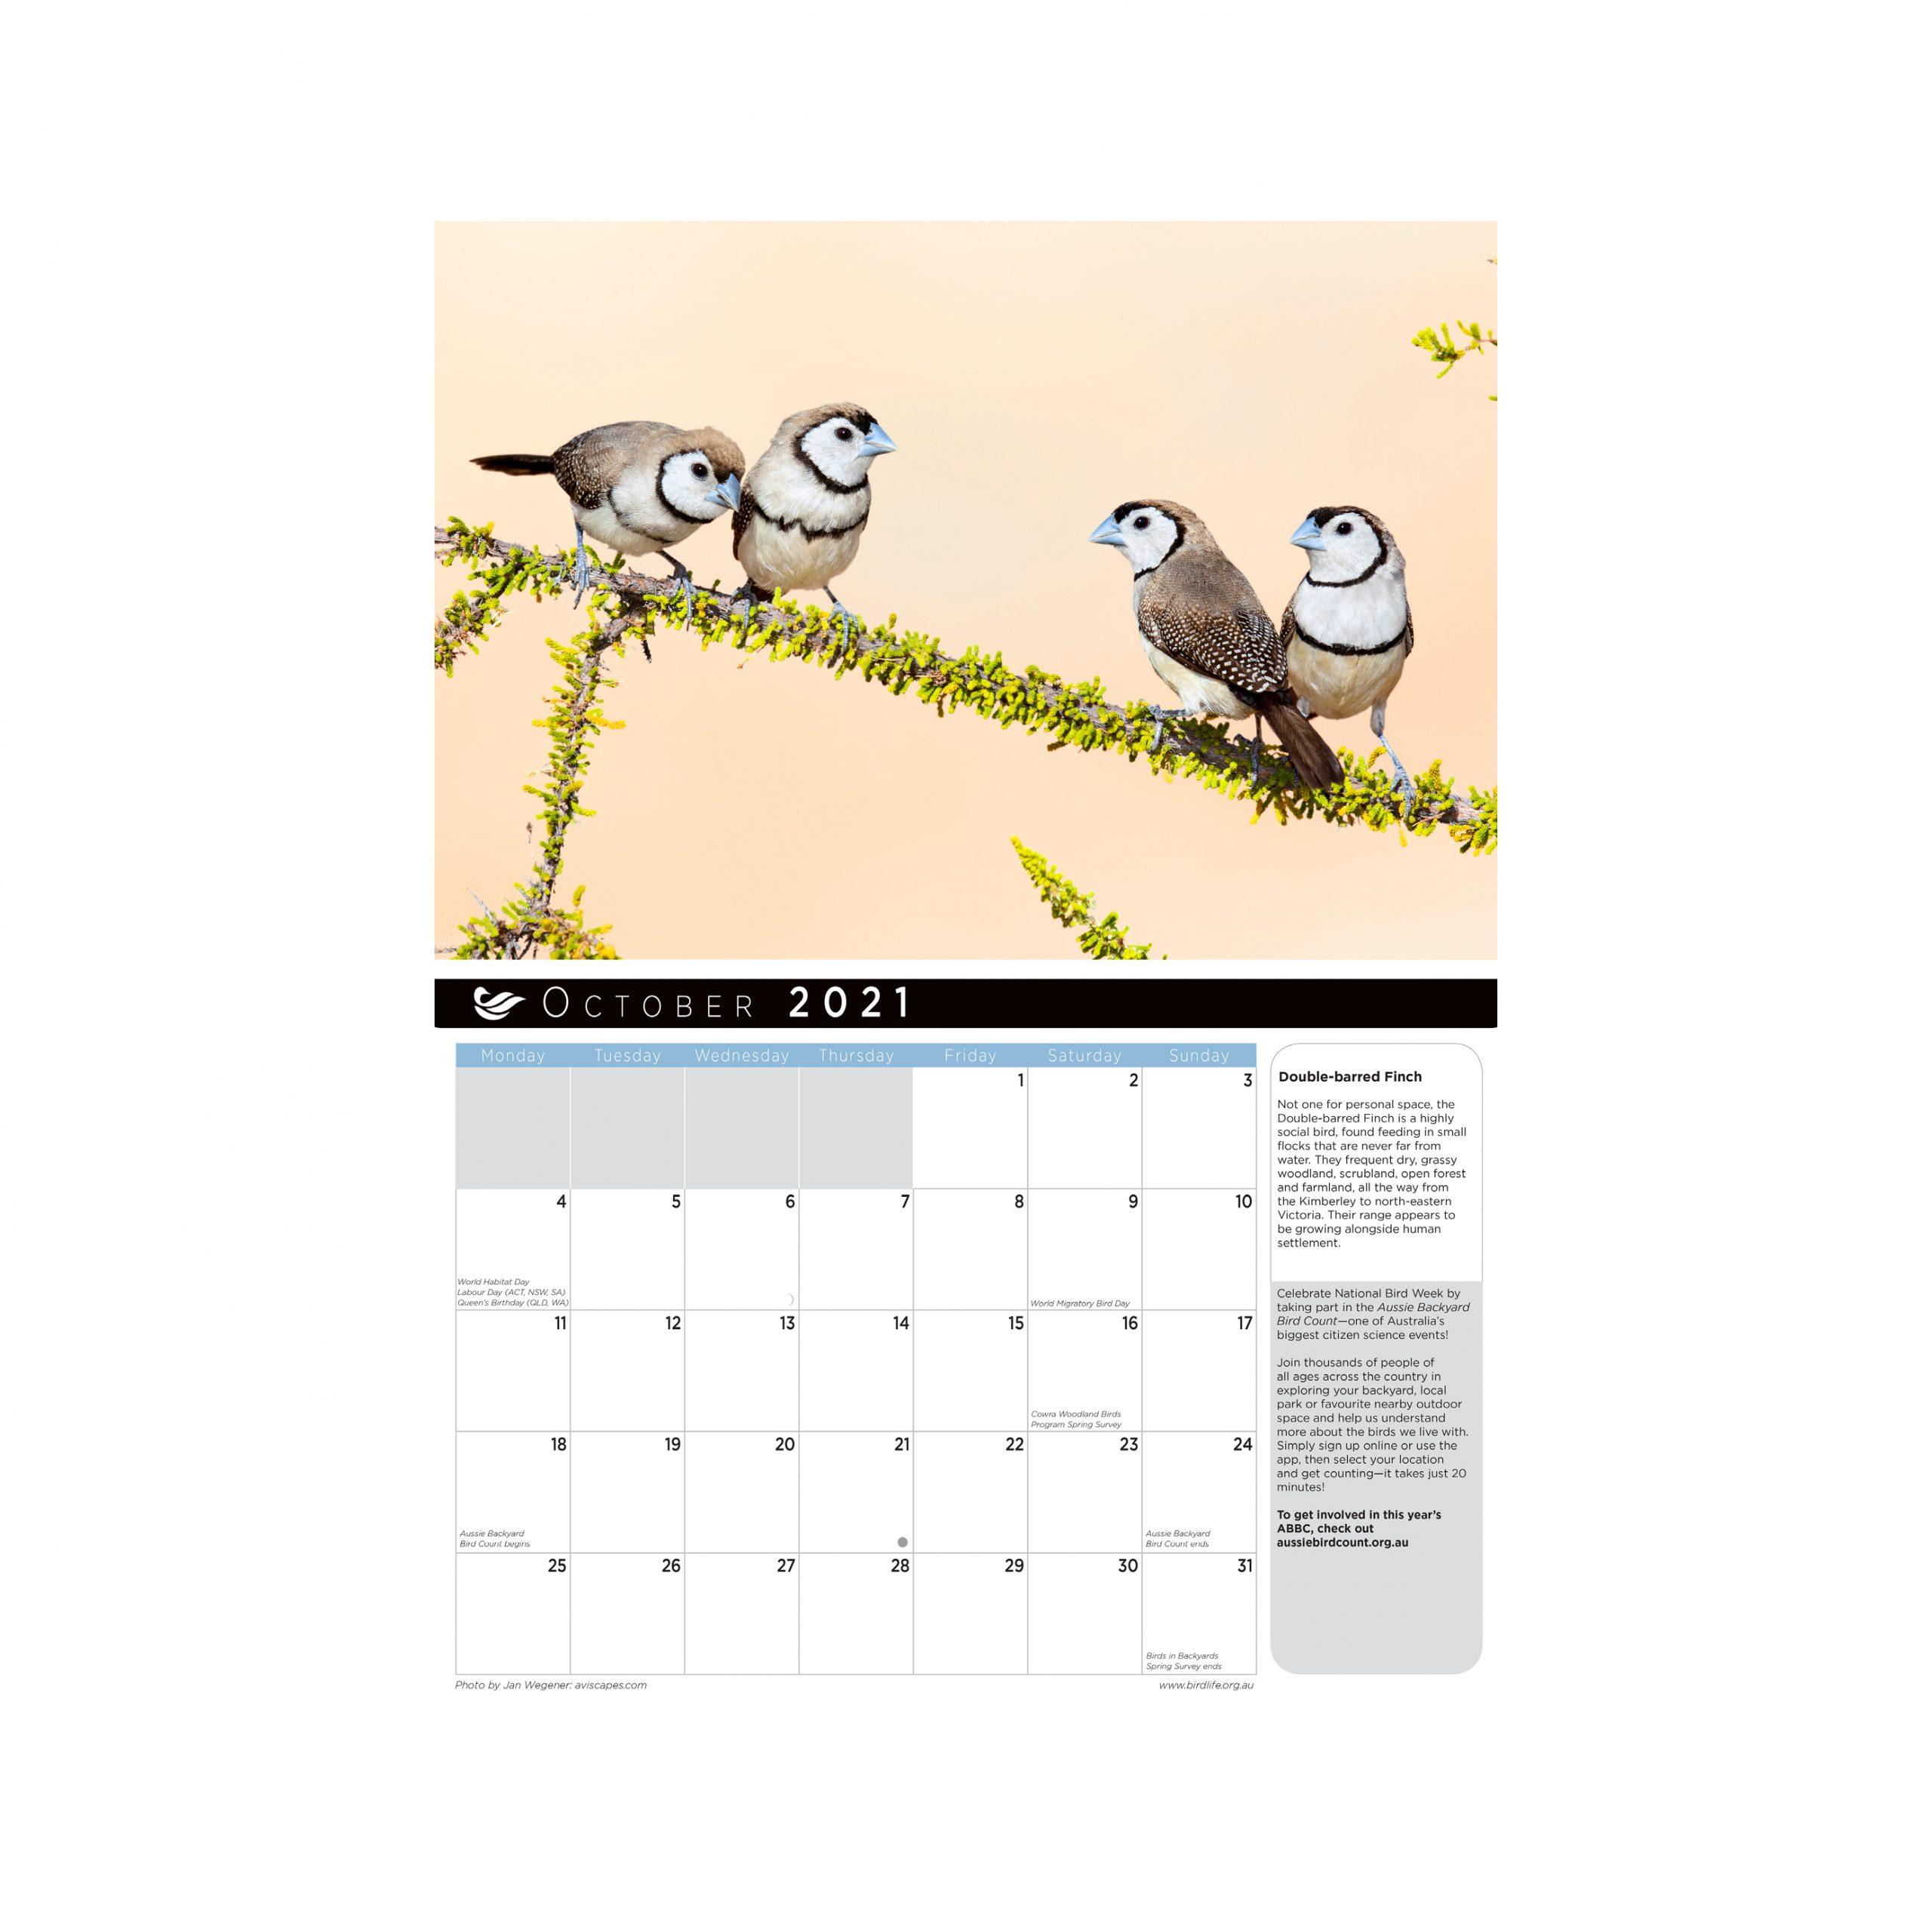 2021 Birds Of A Feather Calendar   Birdlife Australia within Important Awarness Dates 2021 Australia